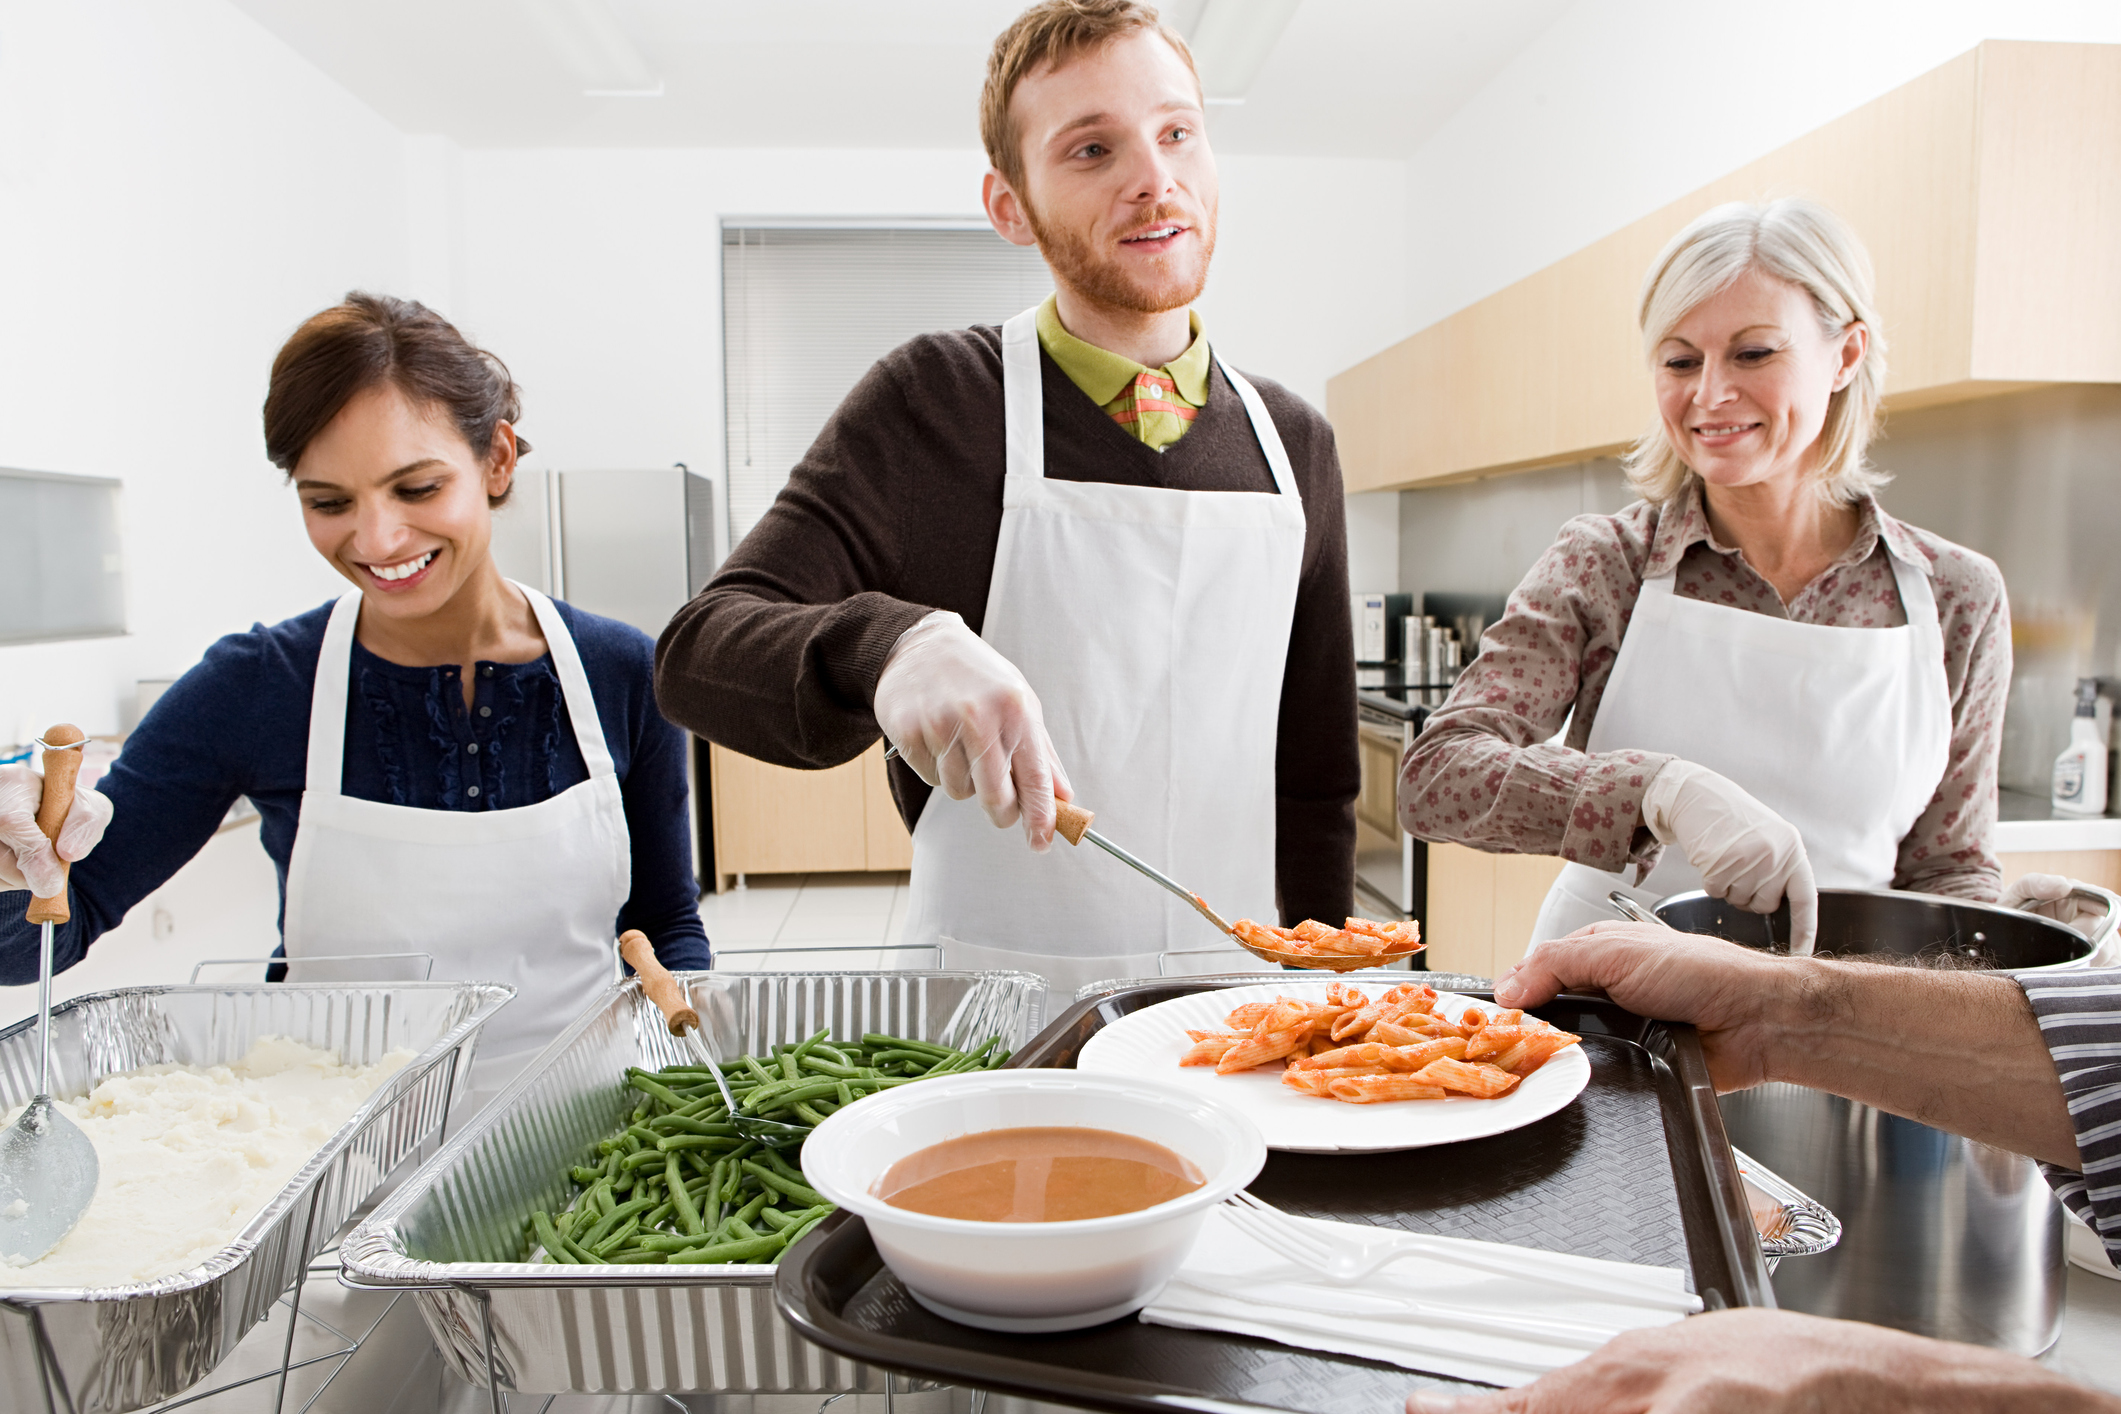 Group of people volunteering in soup kitchen